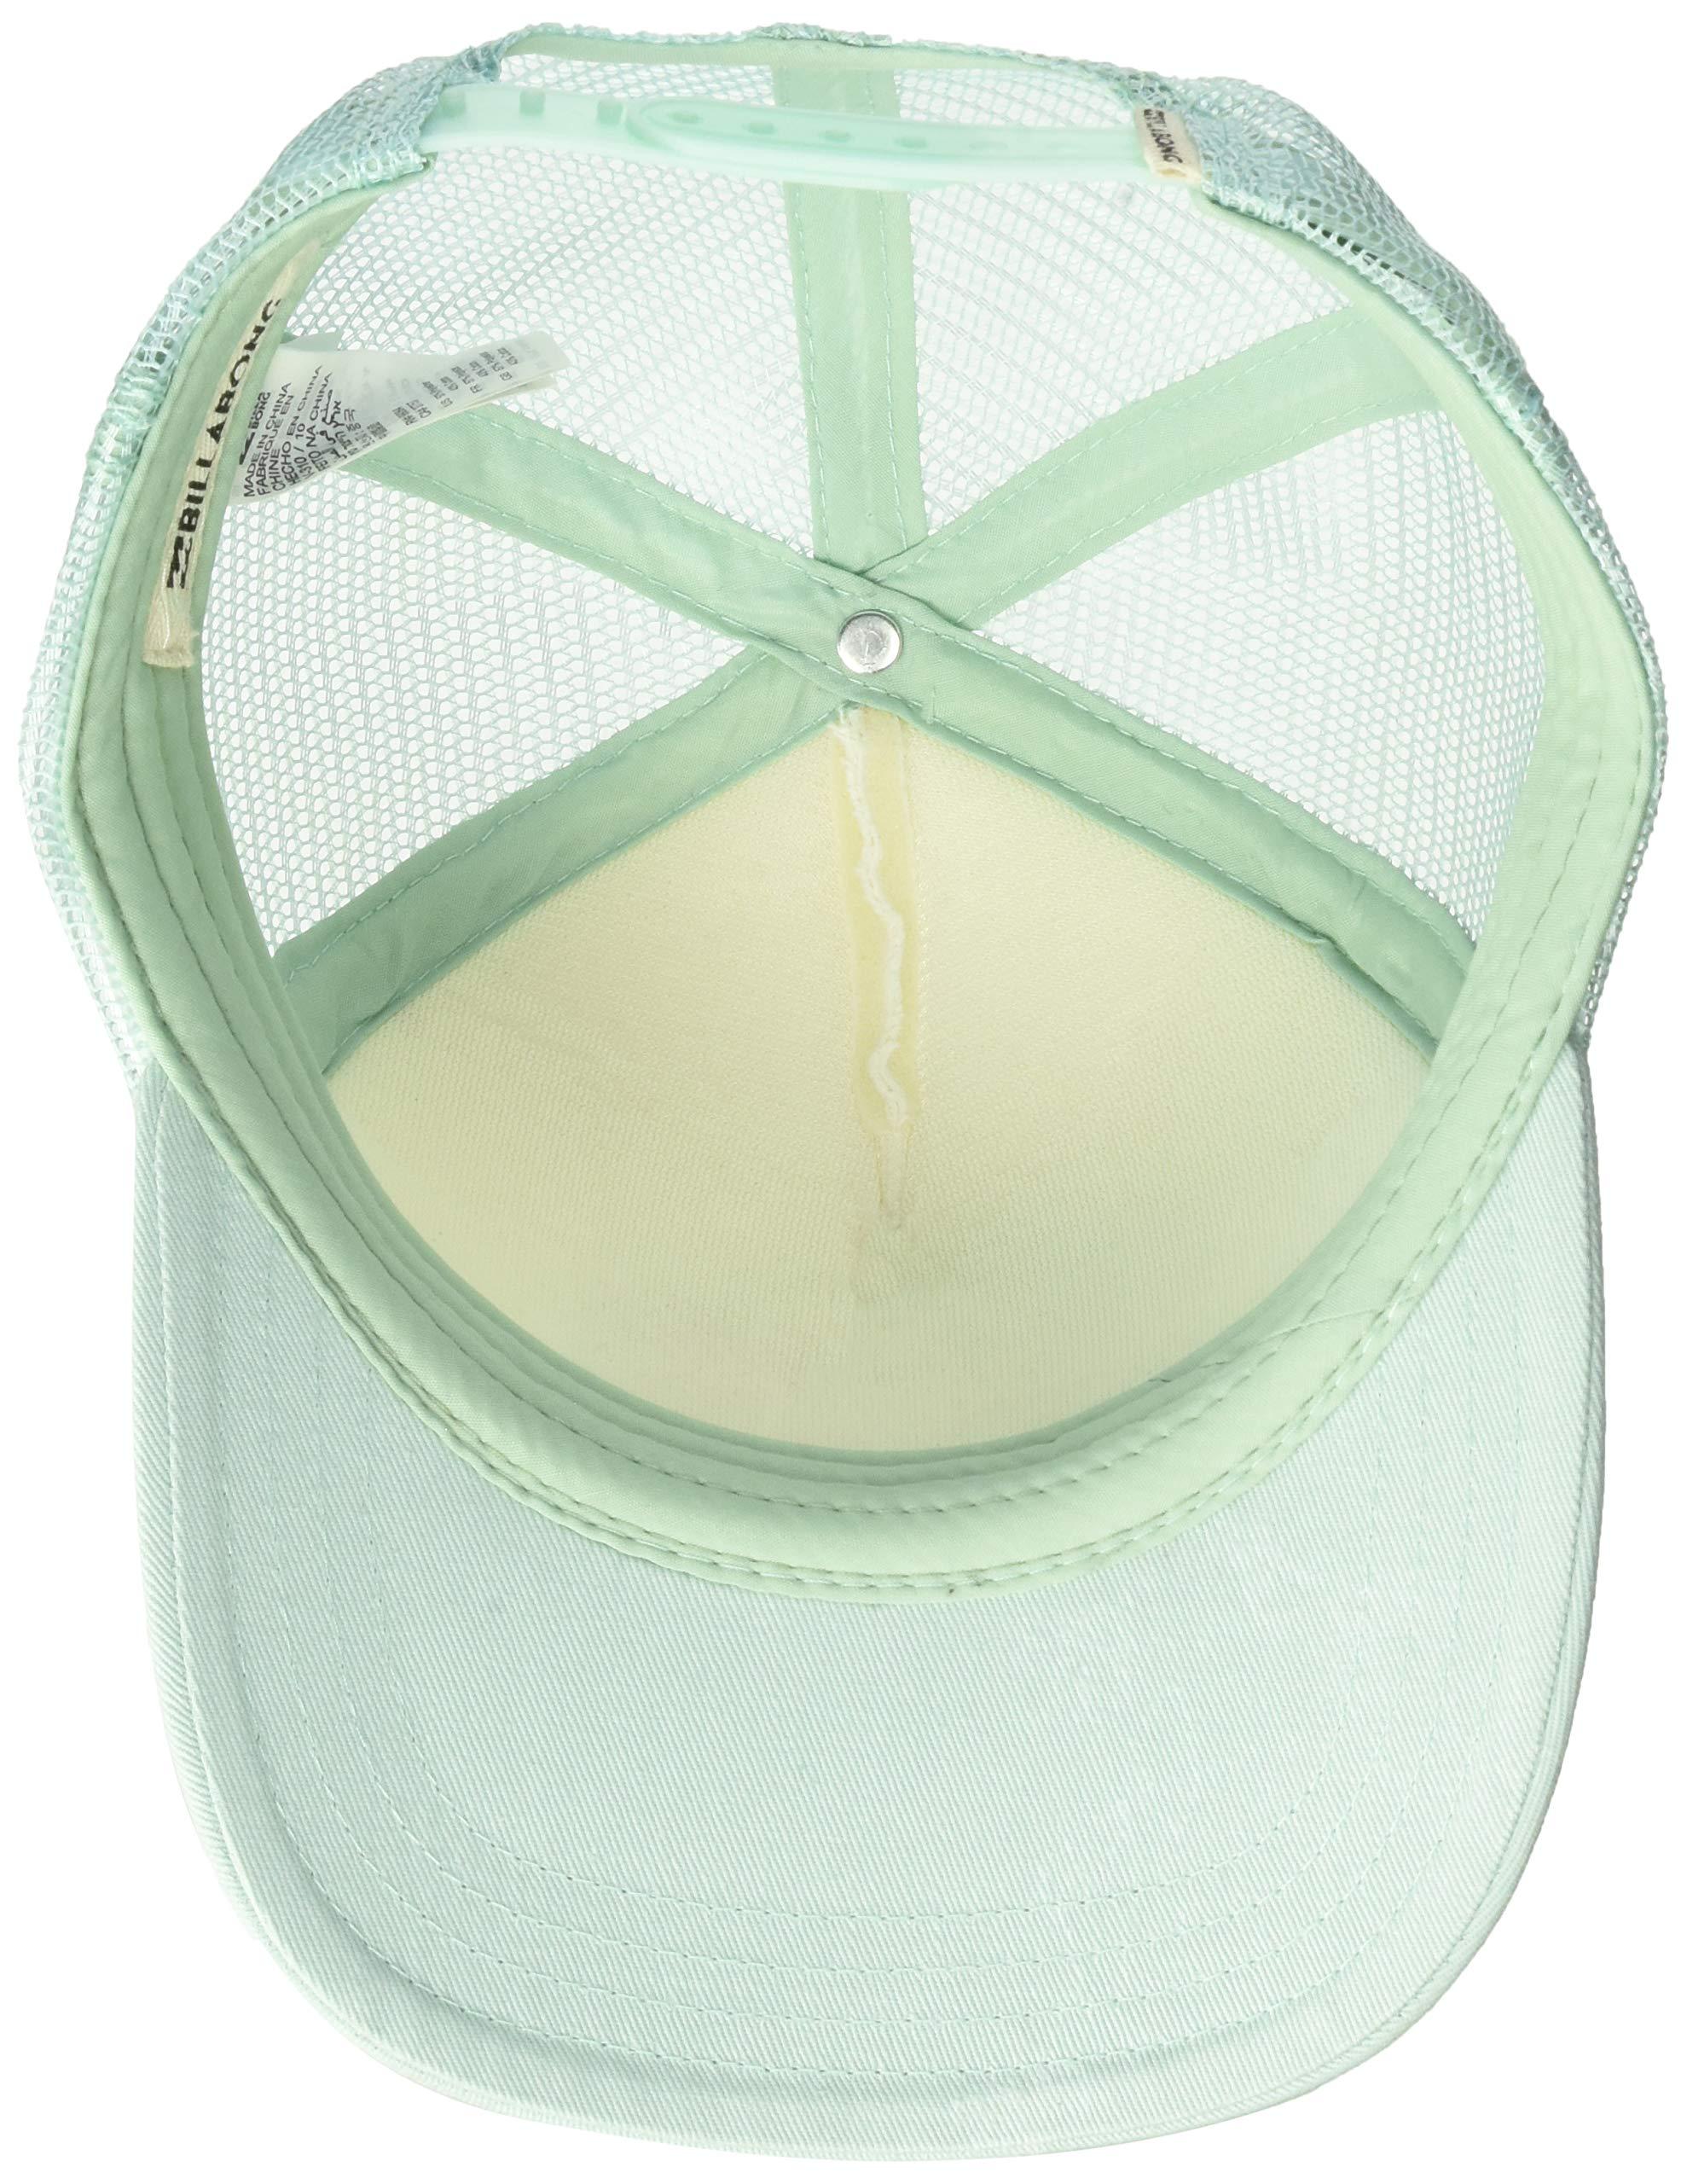 Billabong Girls' Big Cali Vibes Hat, Beach Glass, ONE by Billabong (Image #3)